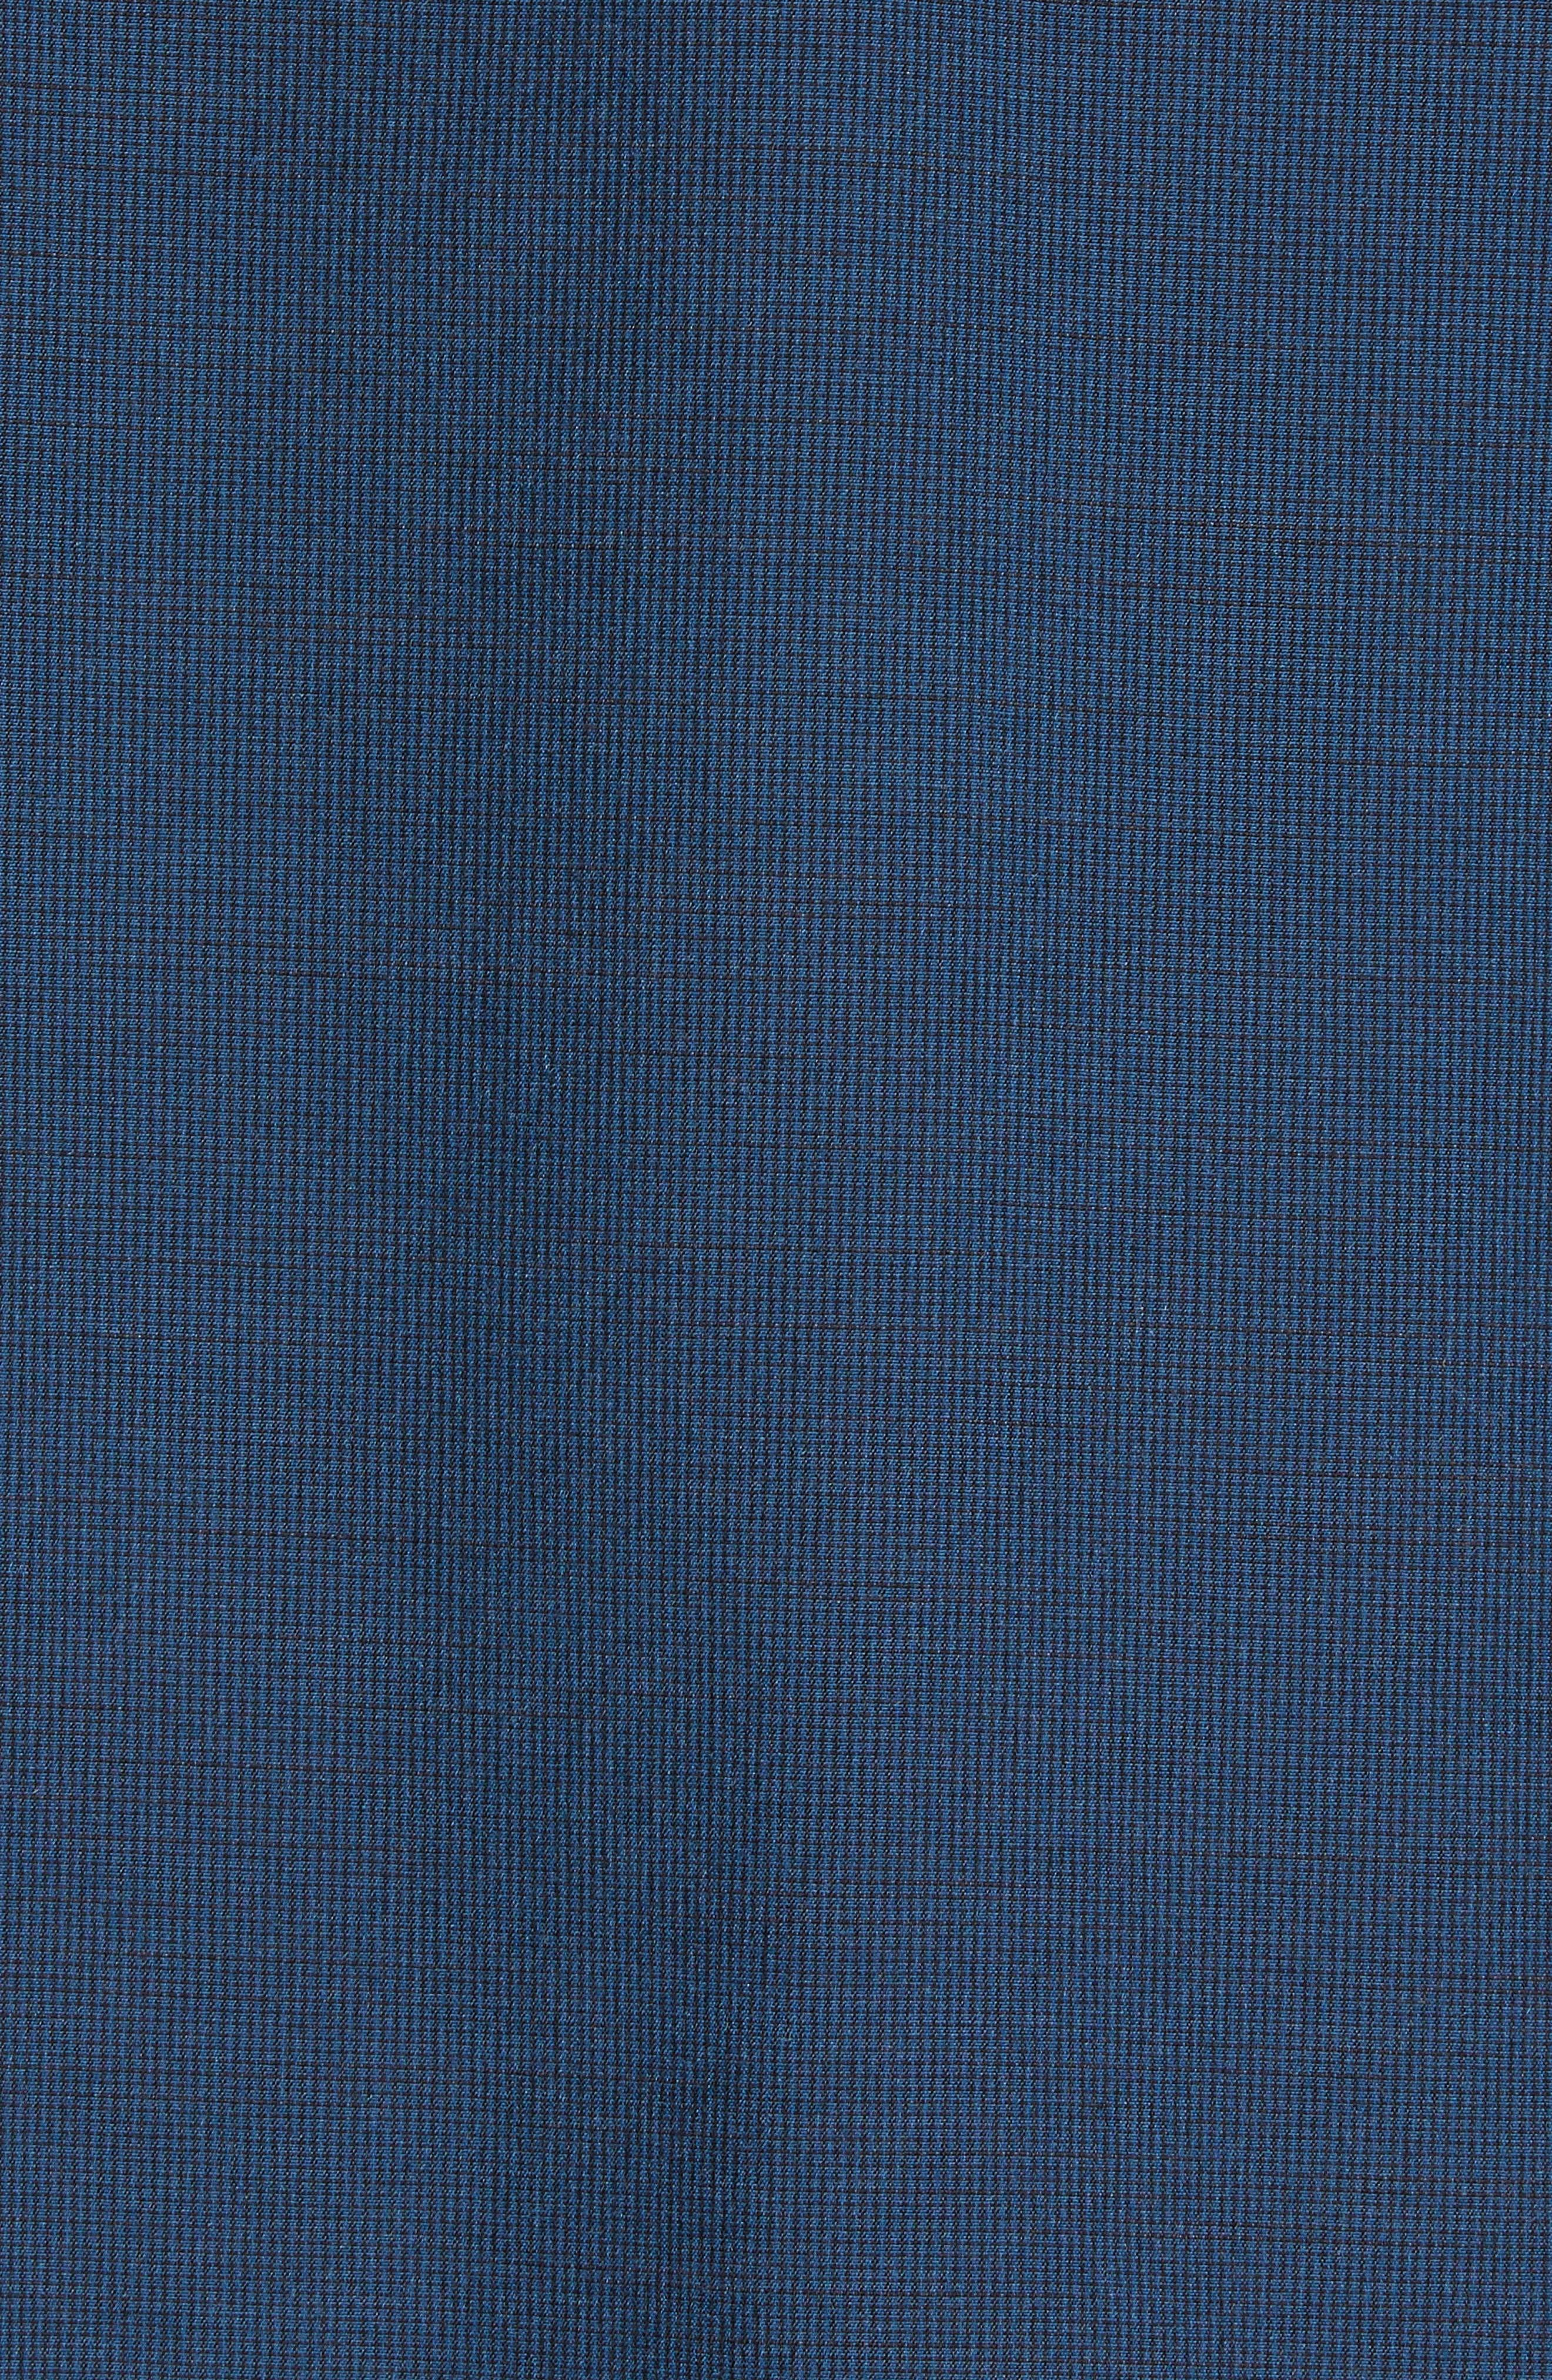 Ridgley Regular Fit Jacket,                             Alternate thumbnail 6, color,                             BLUE WING TEAL/ BLACK